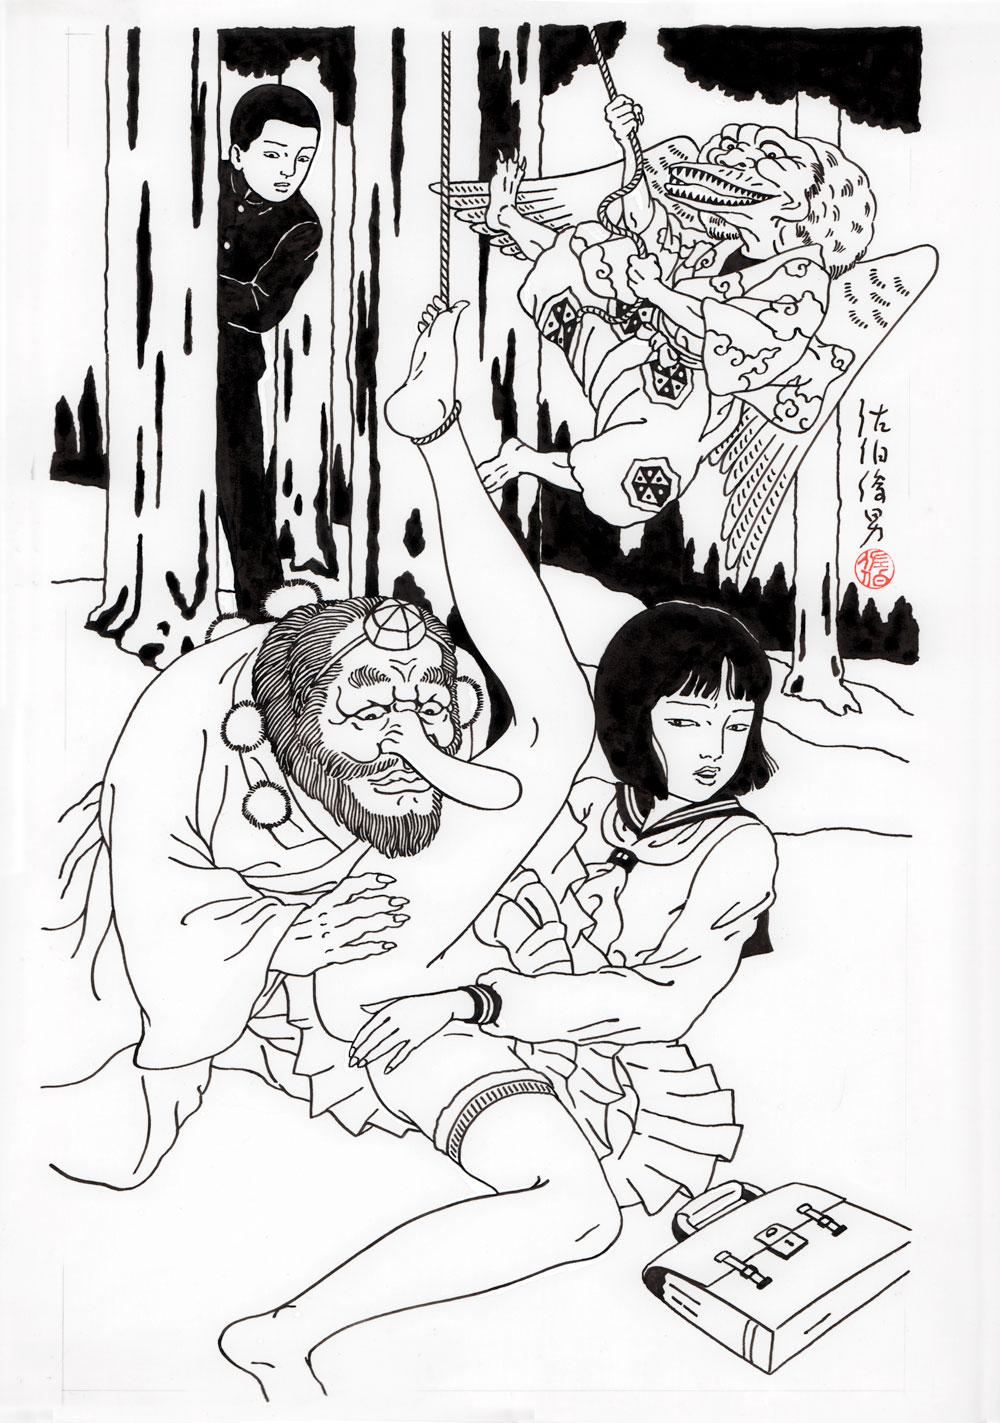 Toshio SaekiMichikusatengu, 1977Ink on paper.12.25 x 18 in. unframed